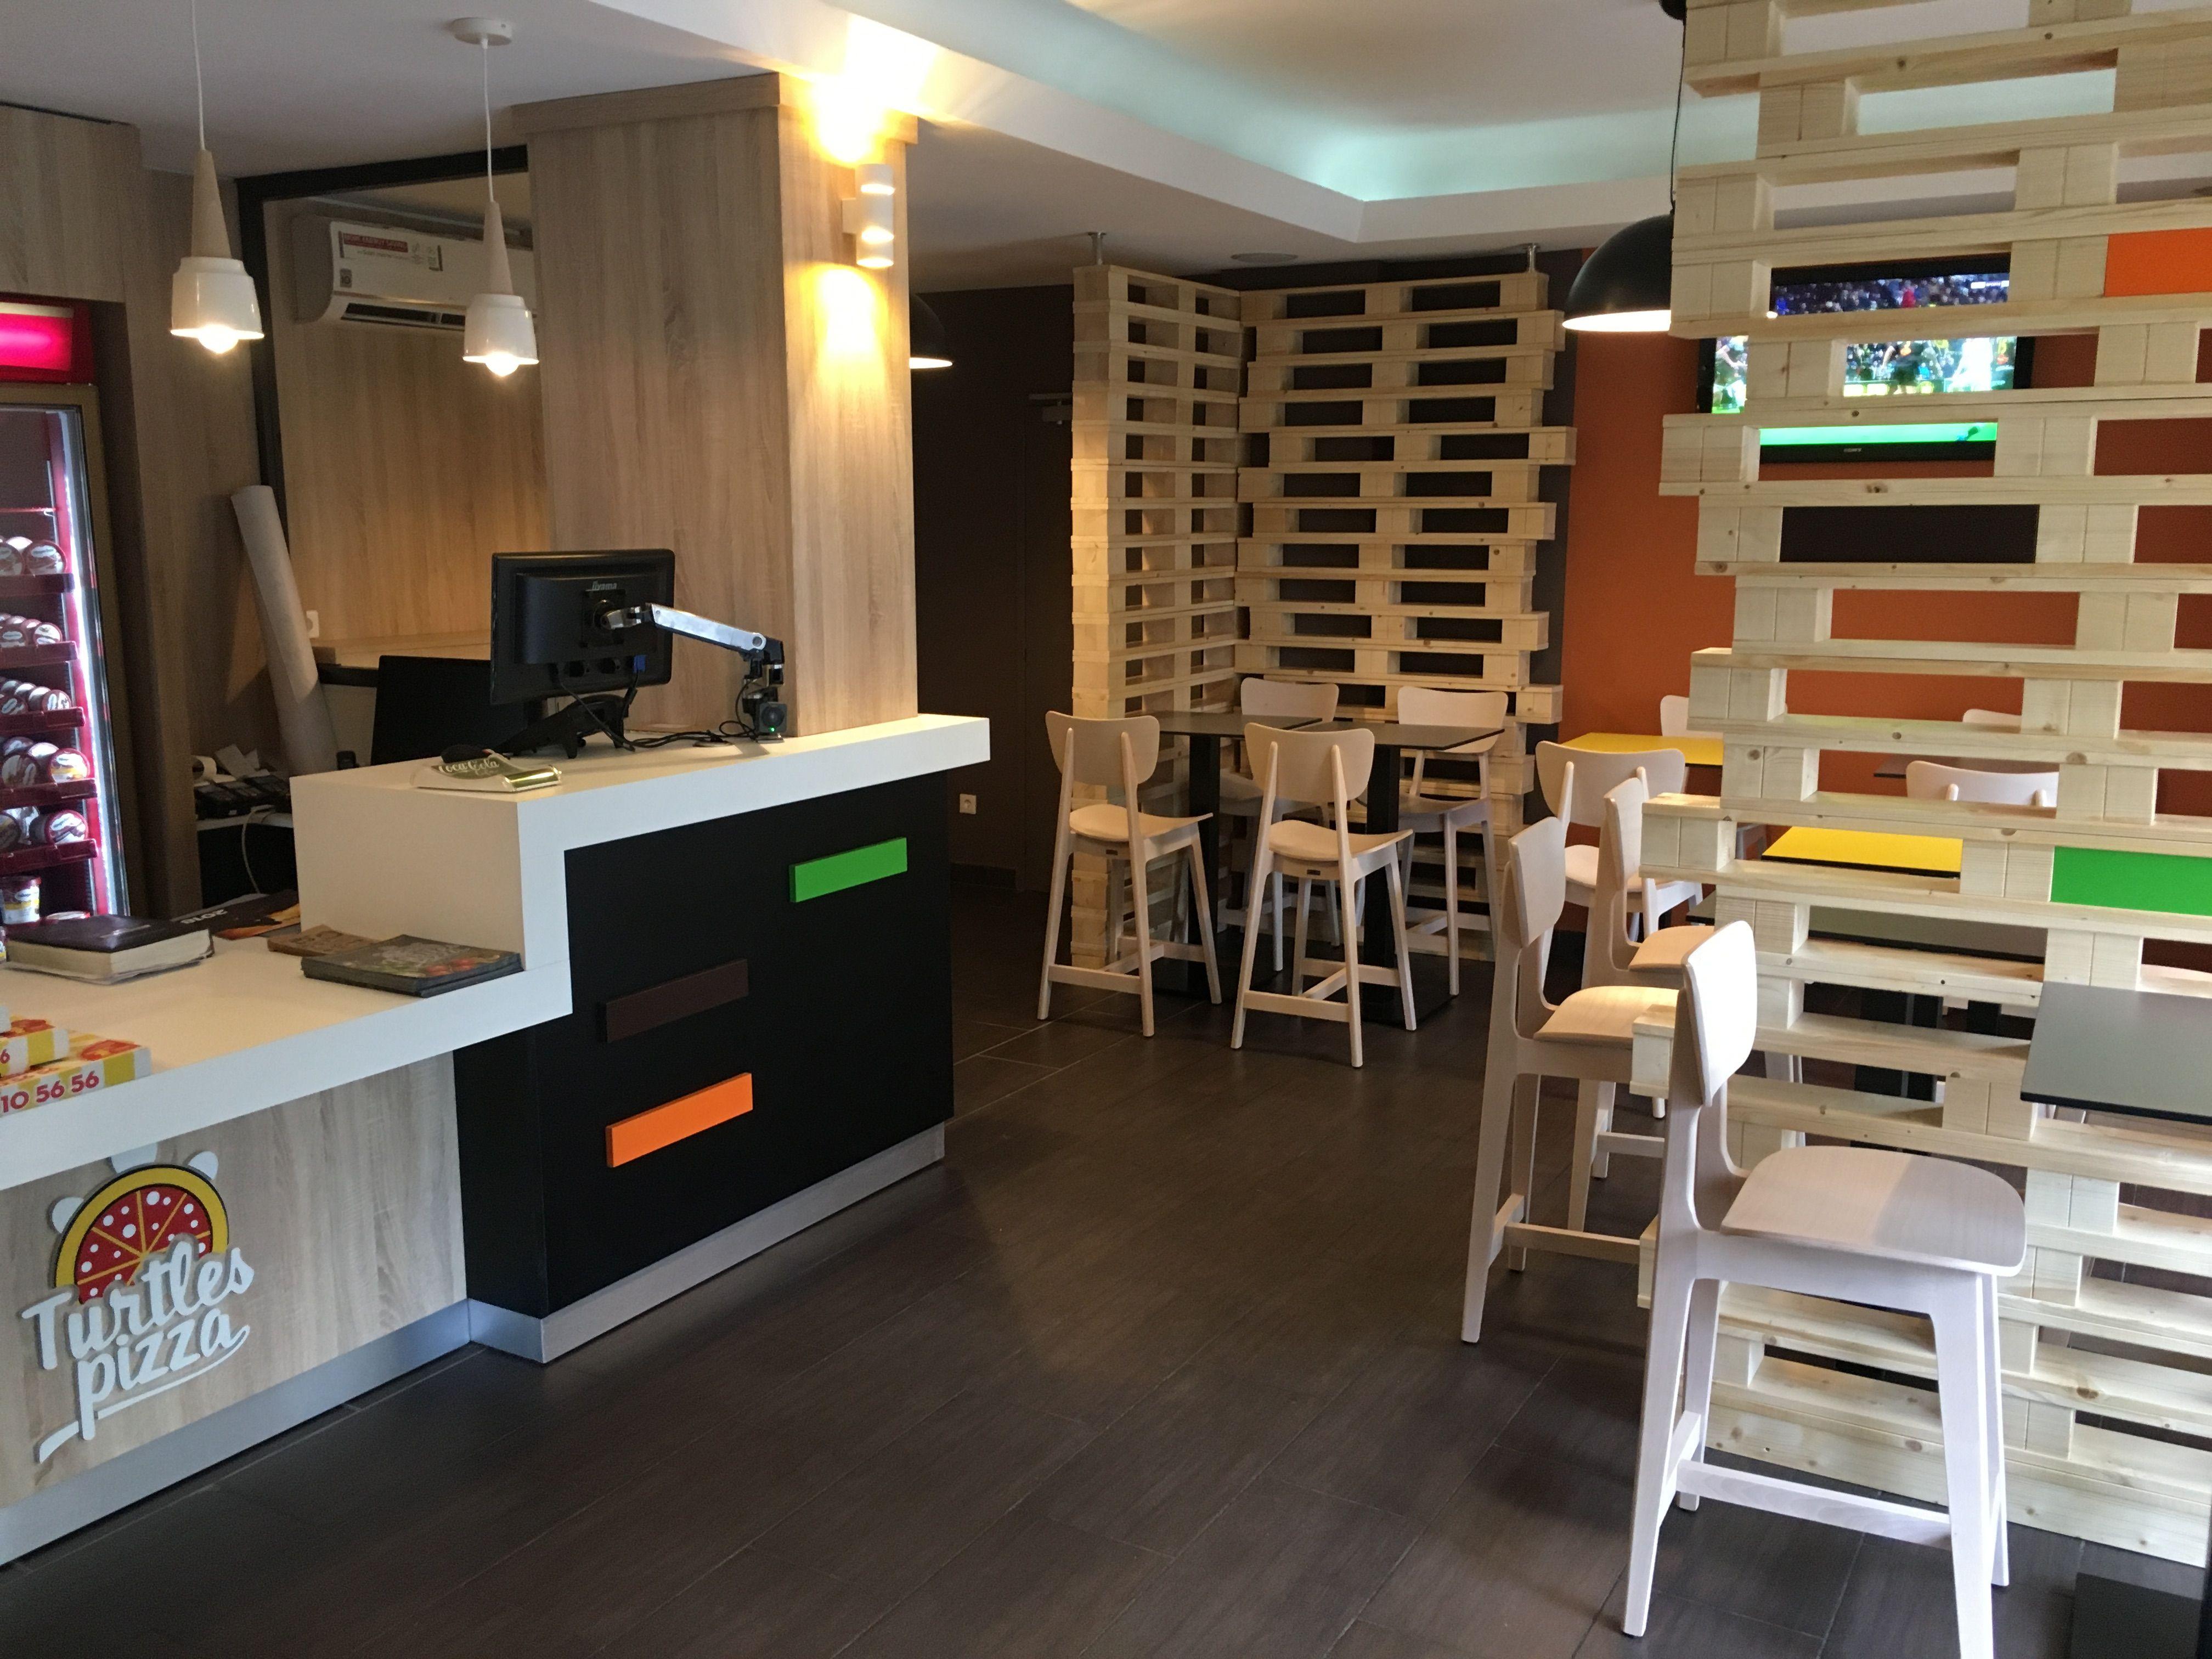 Realisation Mobilier Restauration Rapide Turtles Pizza A Beauvais Restauration Rapide Restaurant Rapide Restaurant